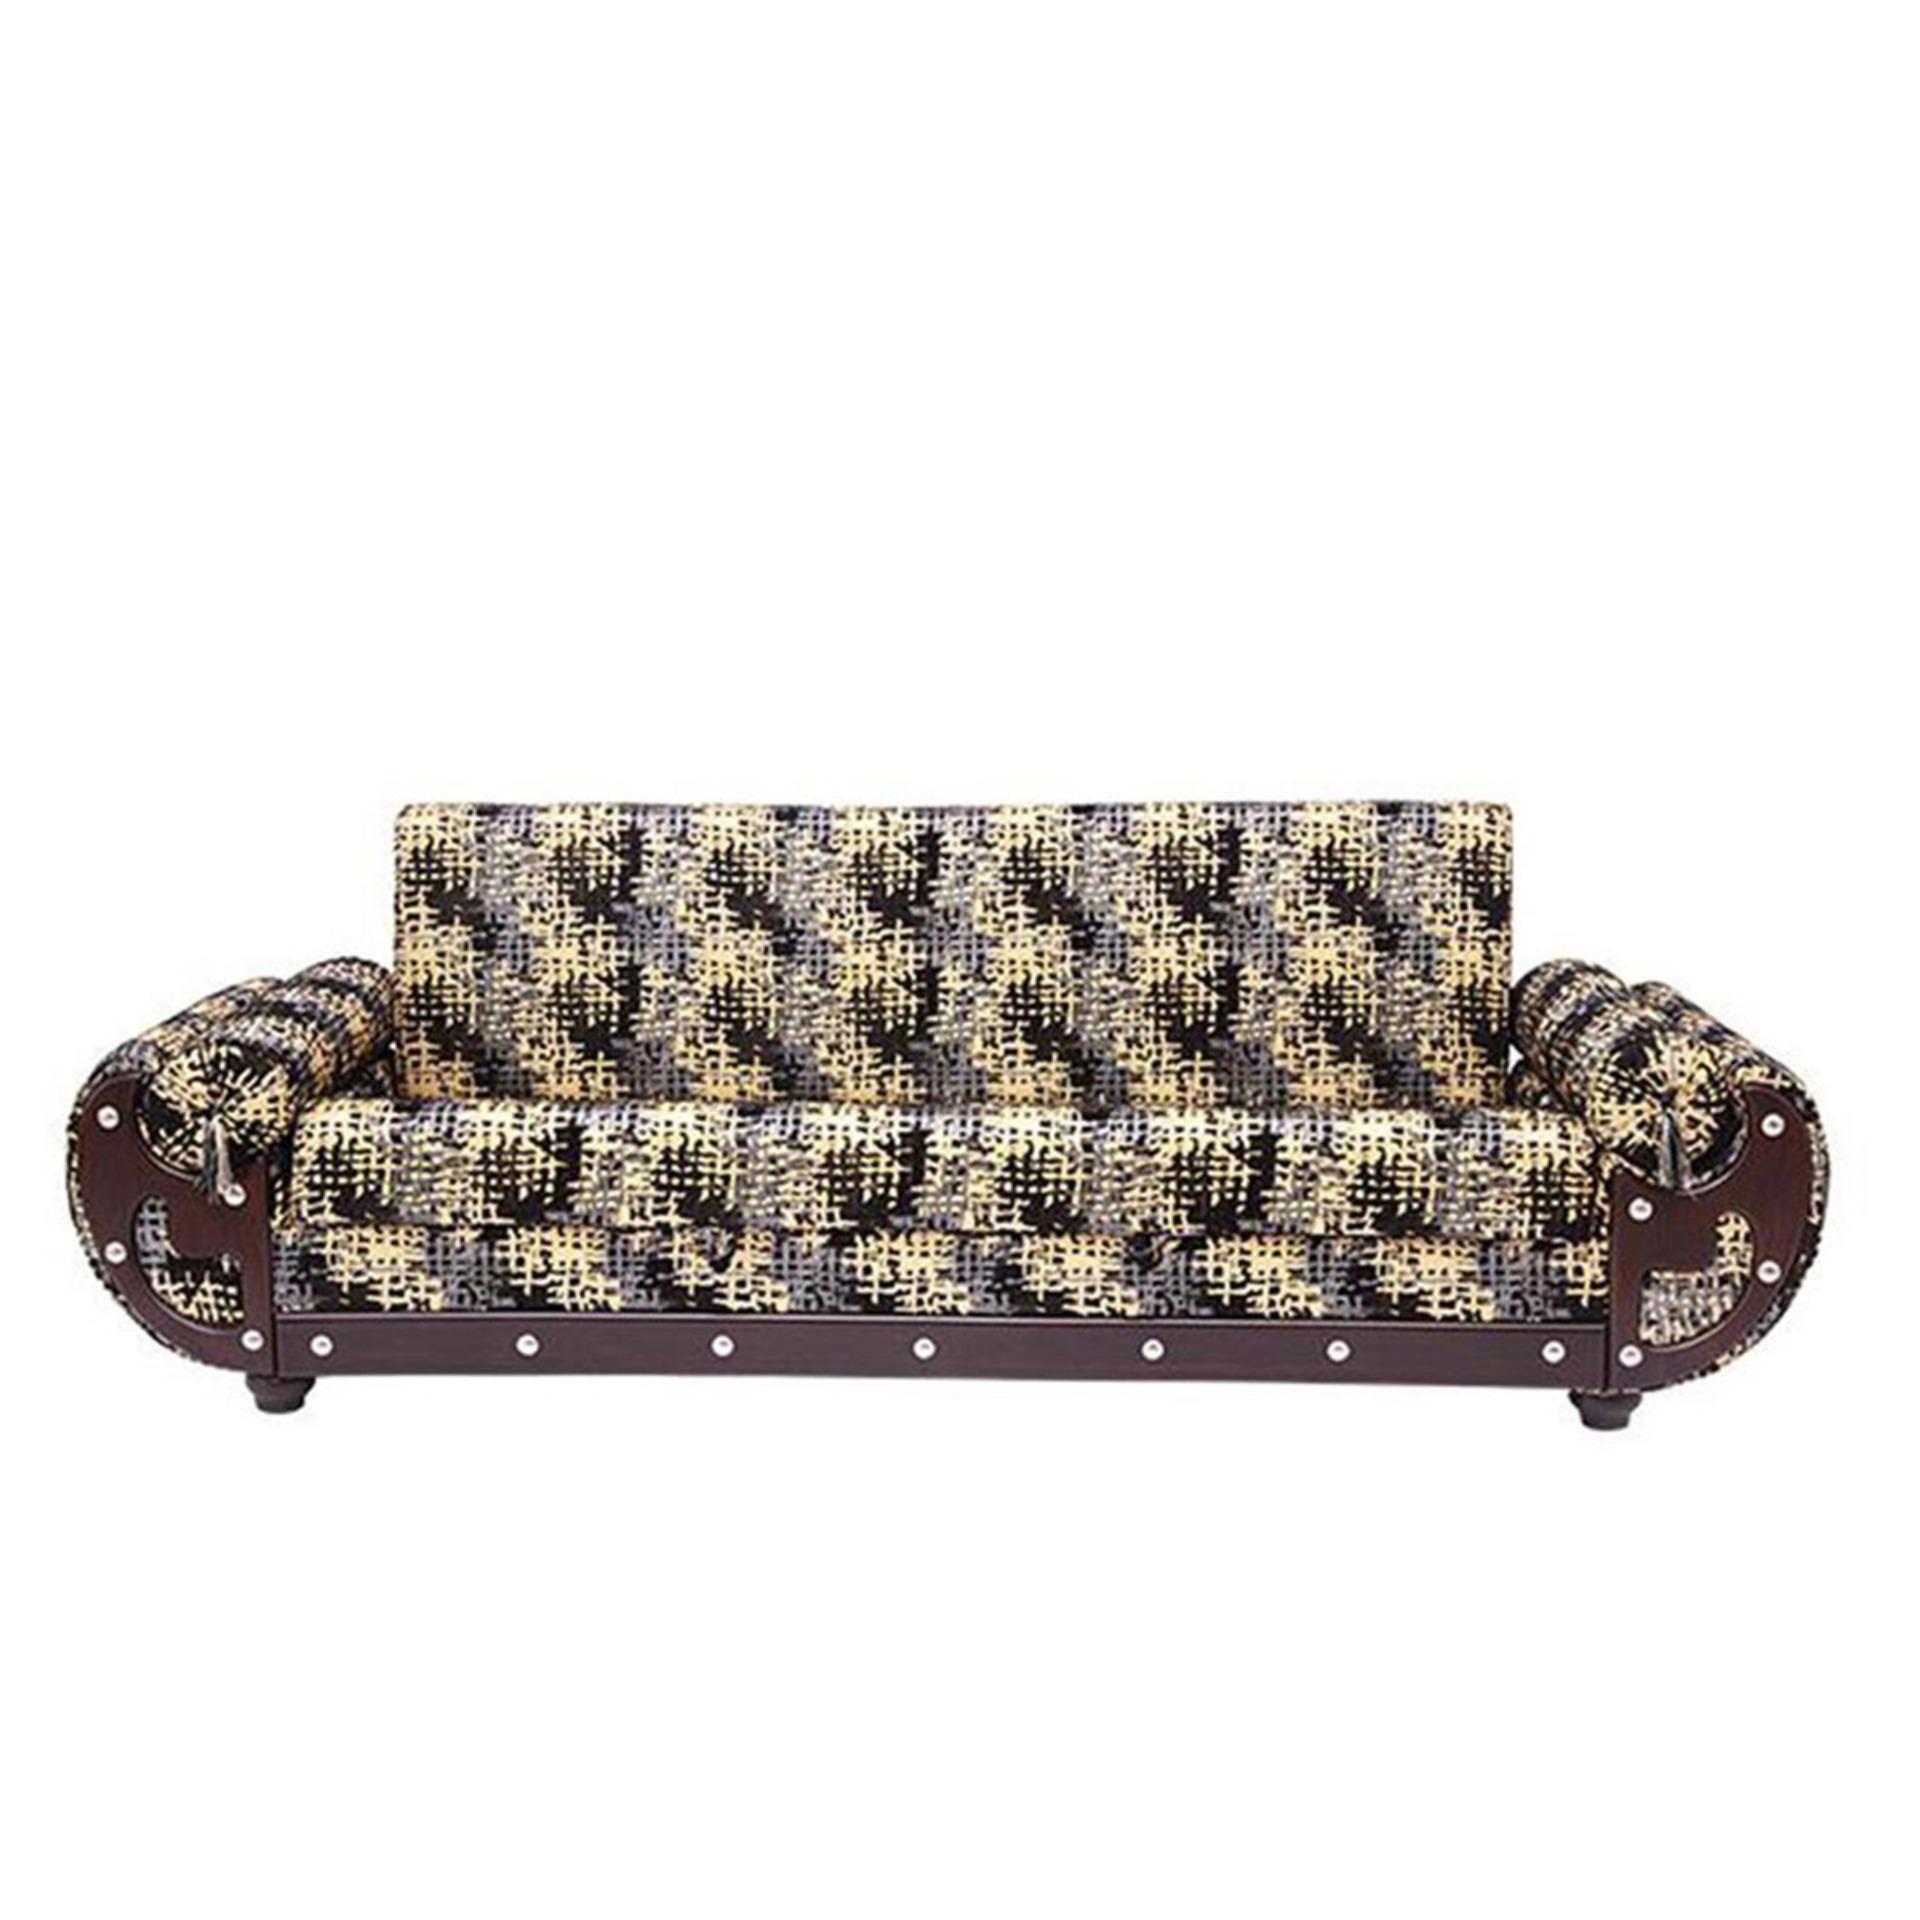 Uni Pearl 3 Seater Sofa Bed